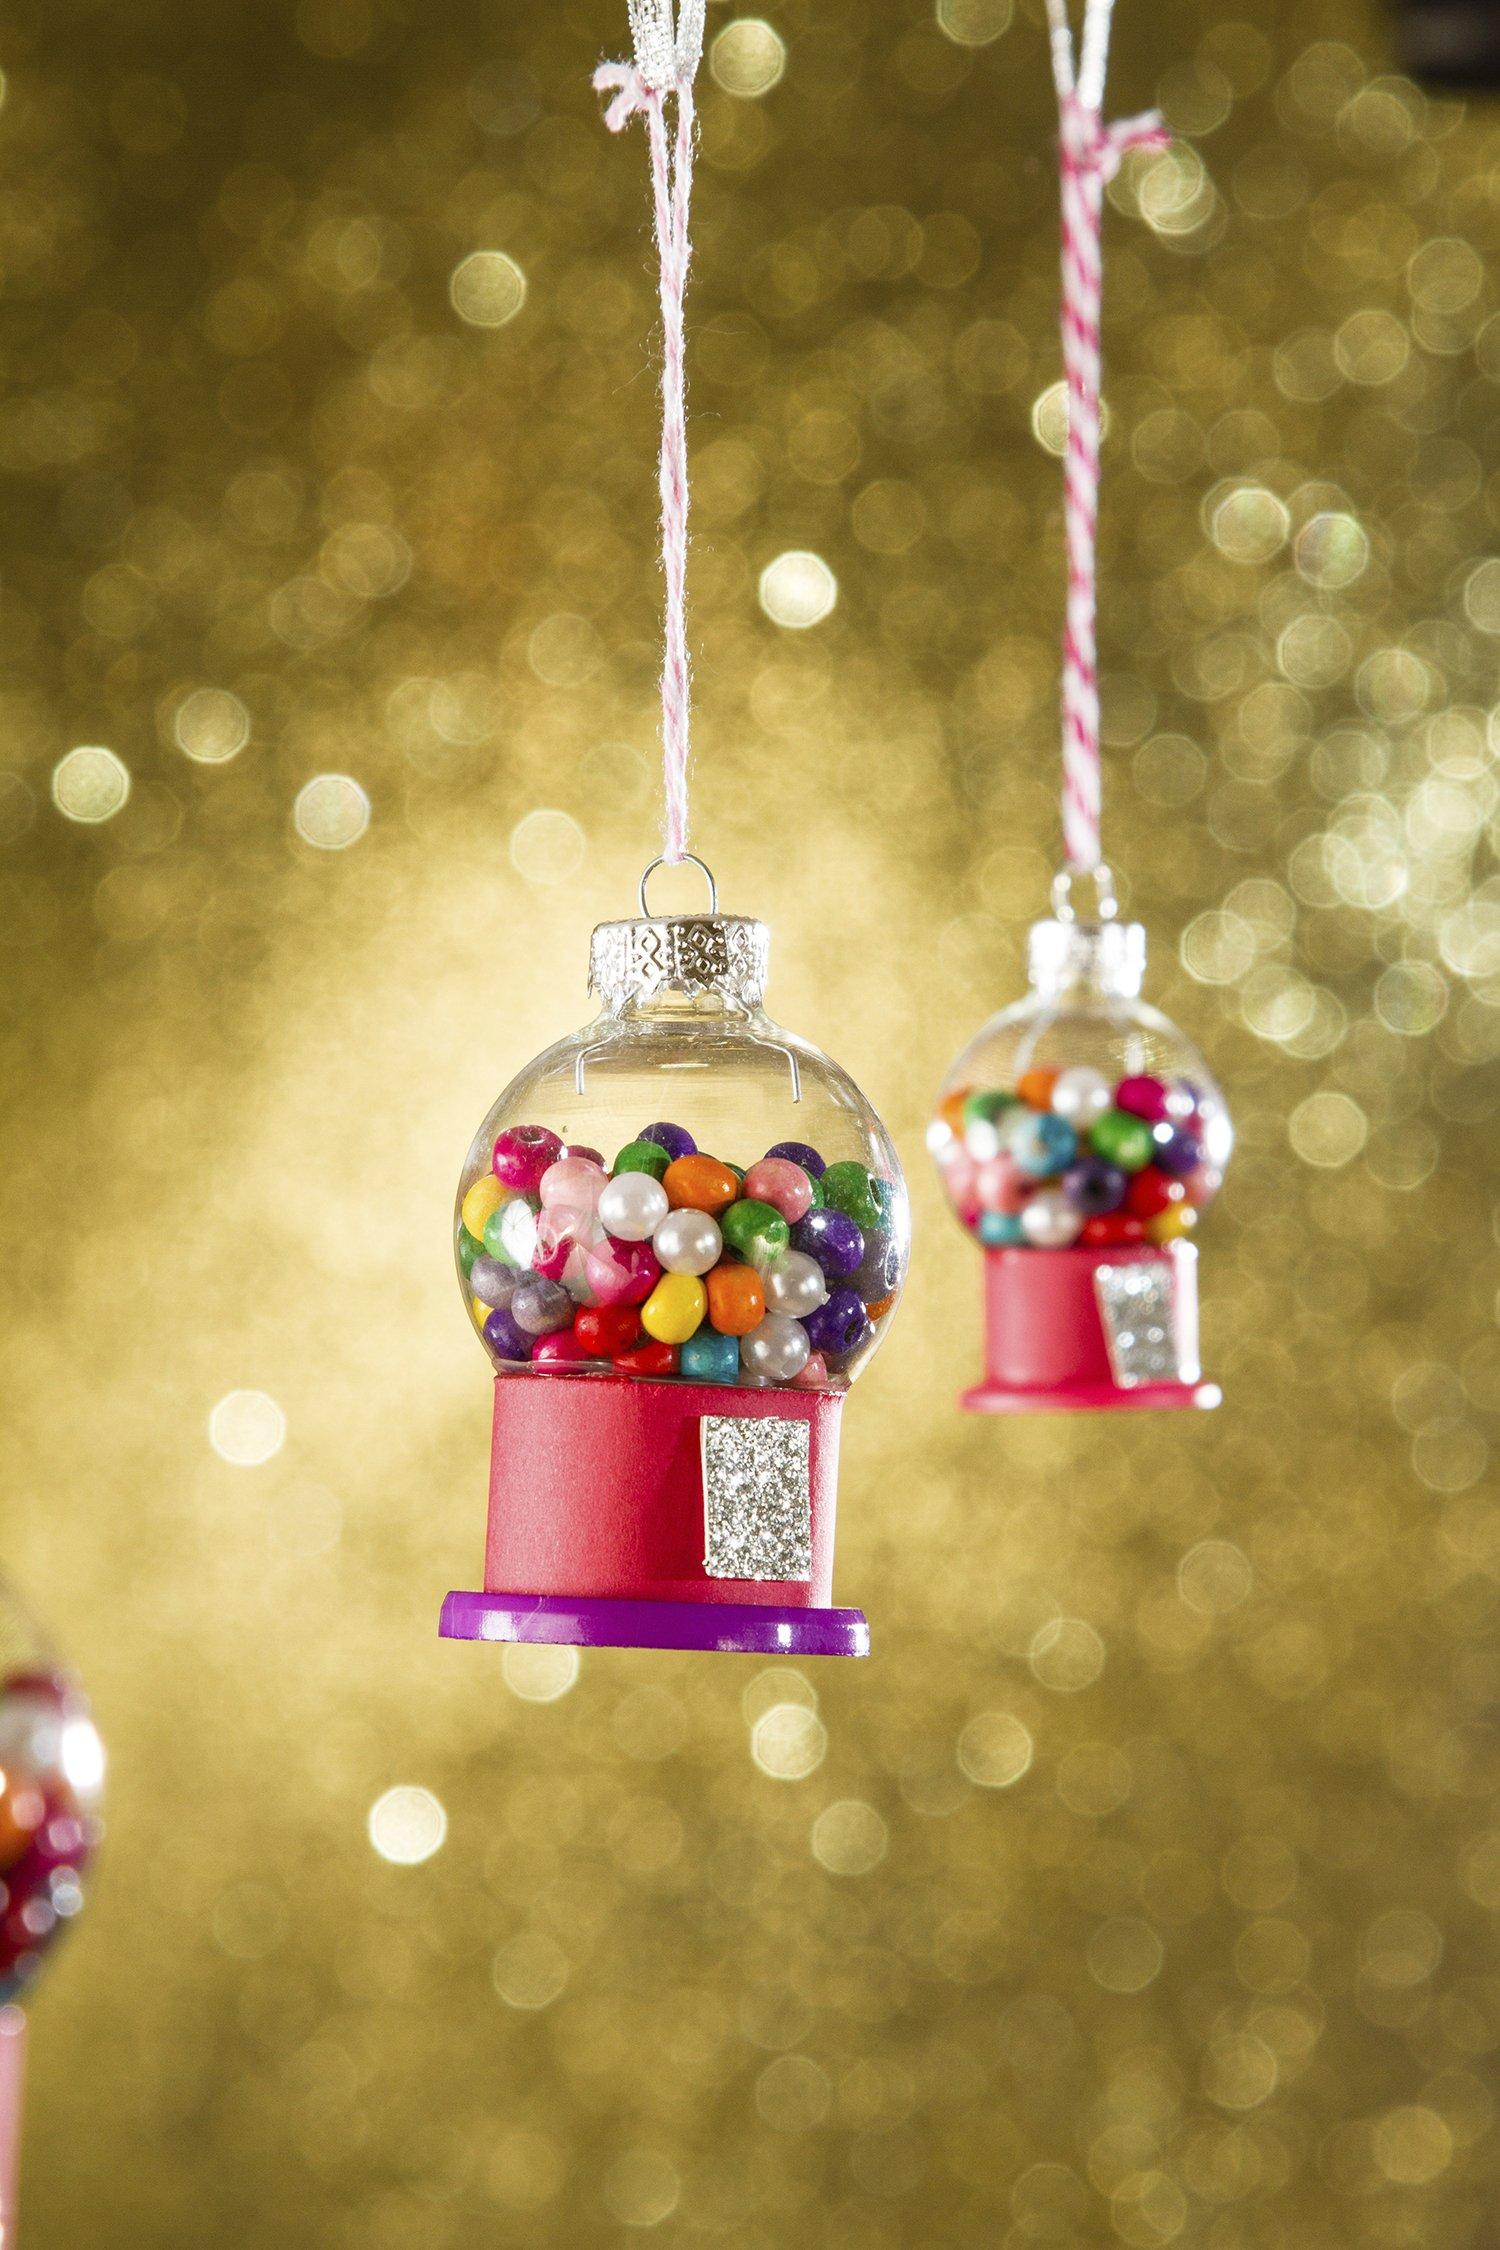 Petite Gumball Machine Ornaments